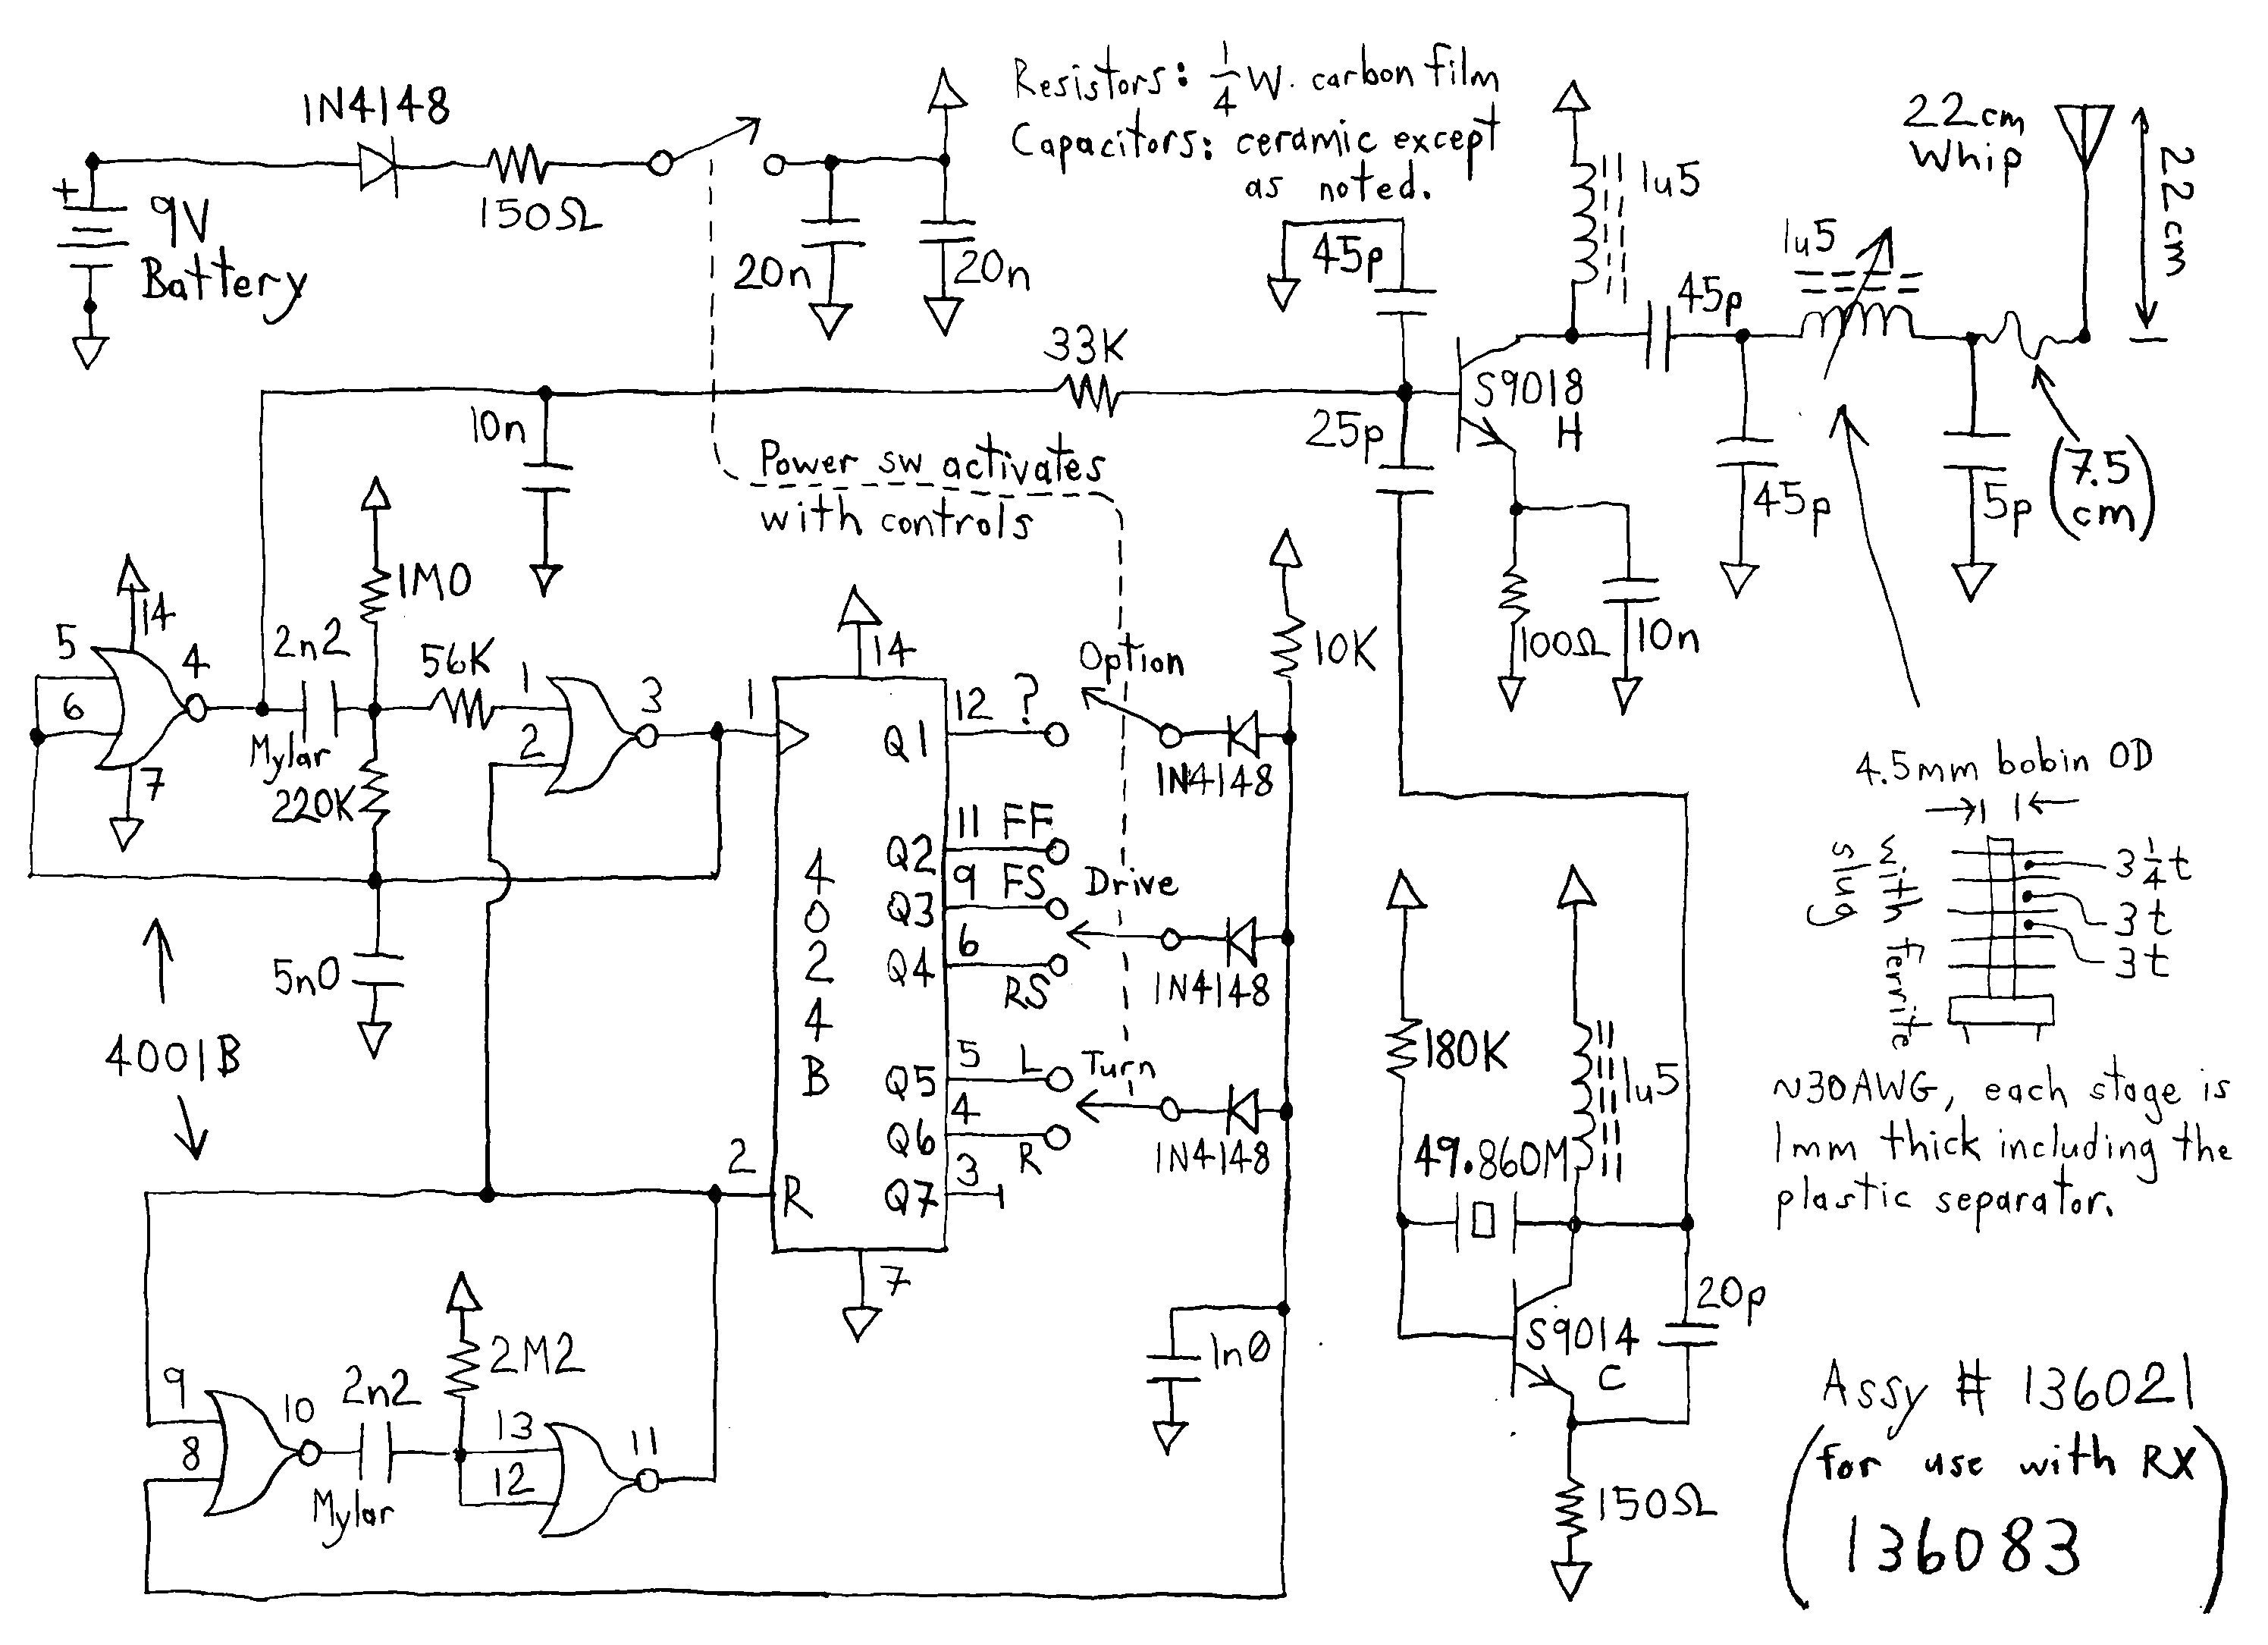 Jeep Jk Headlight Wiring Diagram Jeep Wrangler 2005 Wiring Diagram Wiring Diagram Center